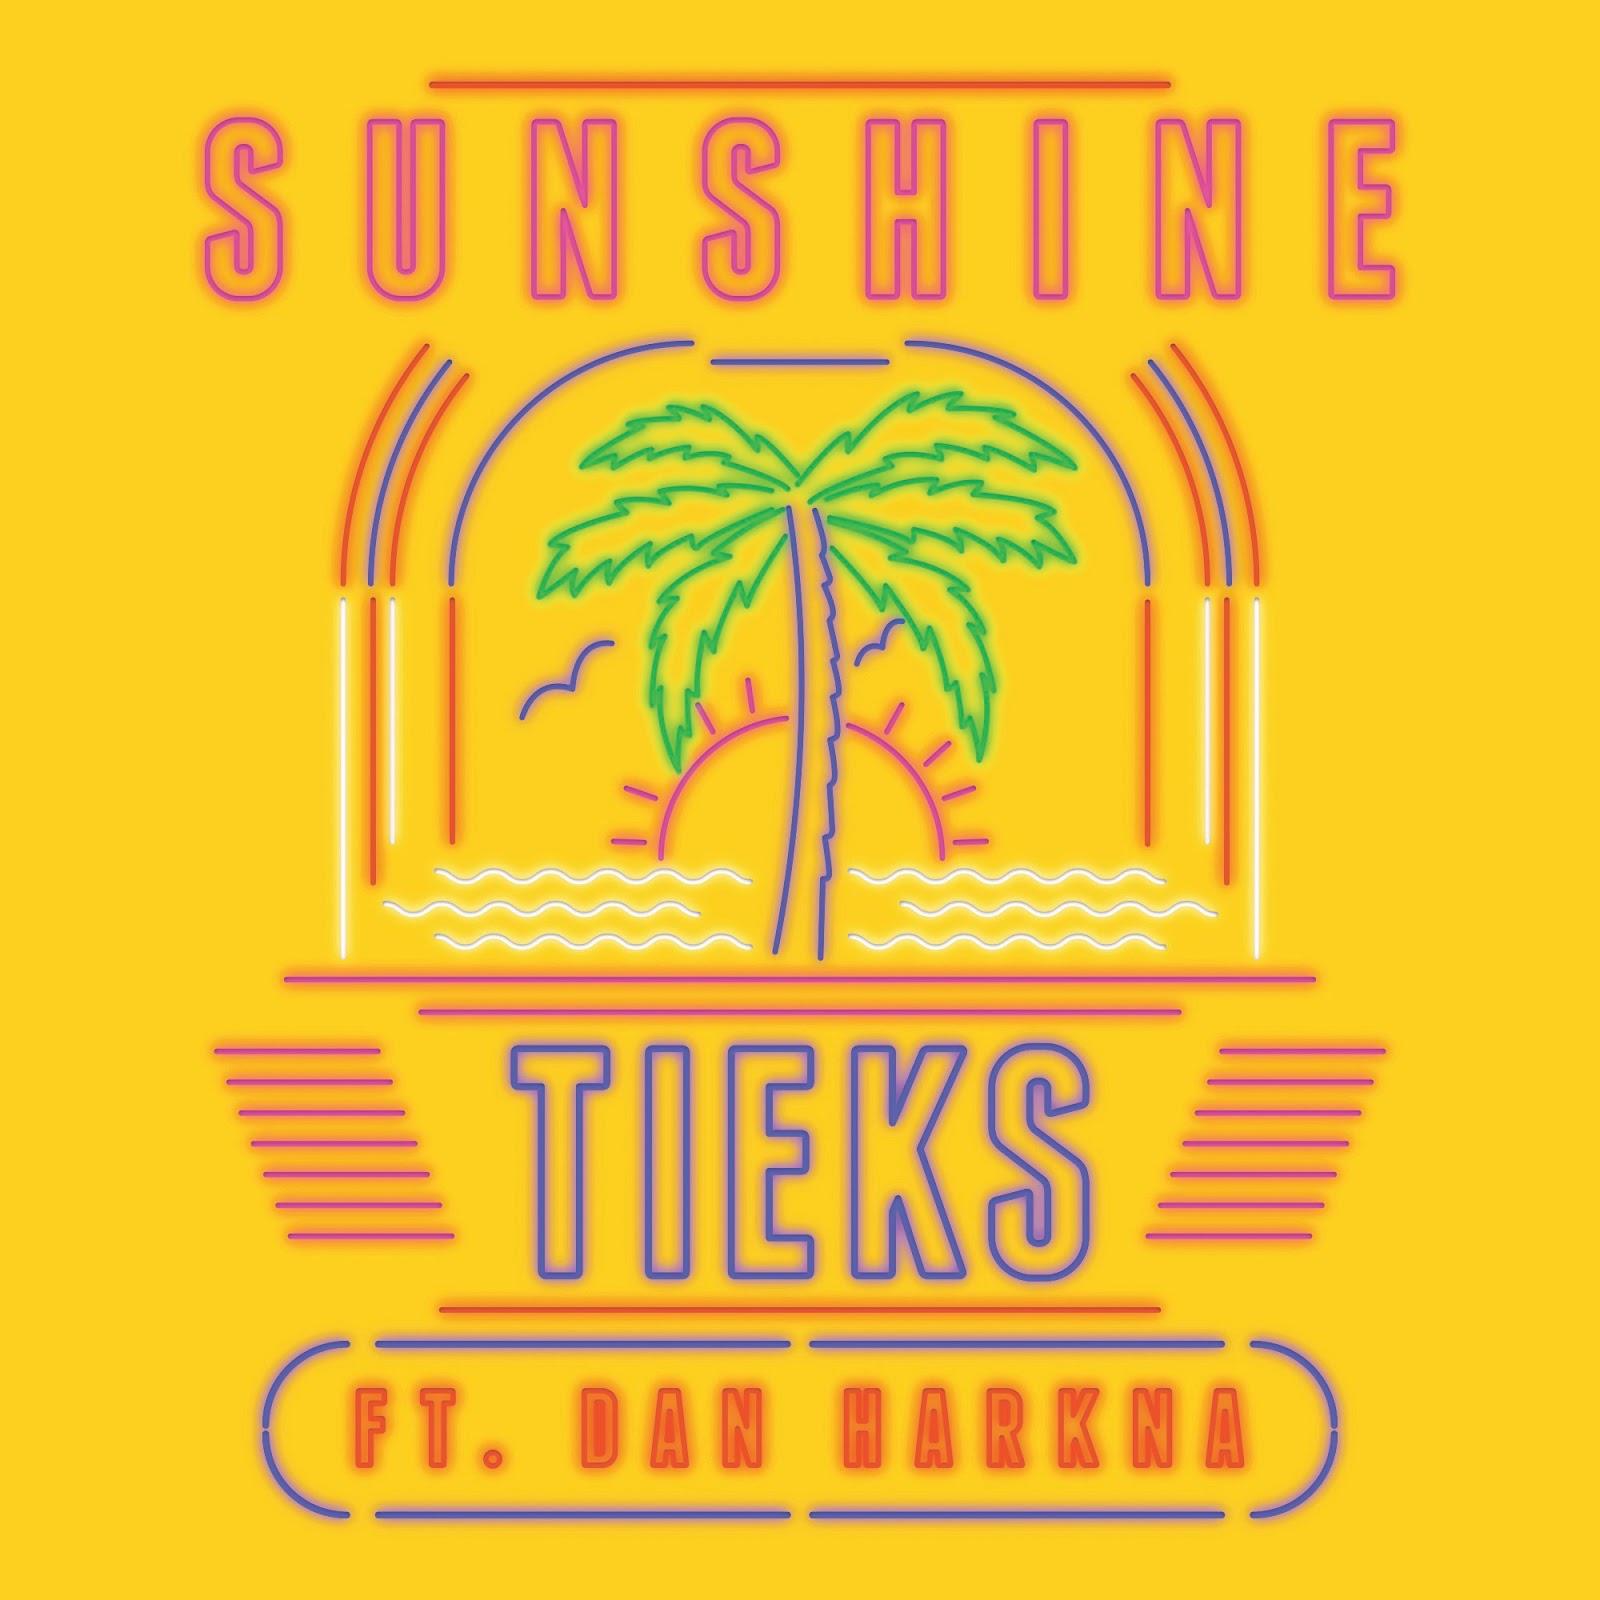 Baixar Tieks - Sunshine (2016) Grátis MP3